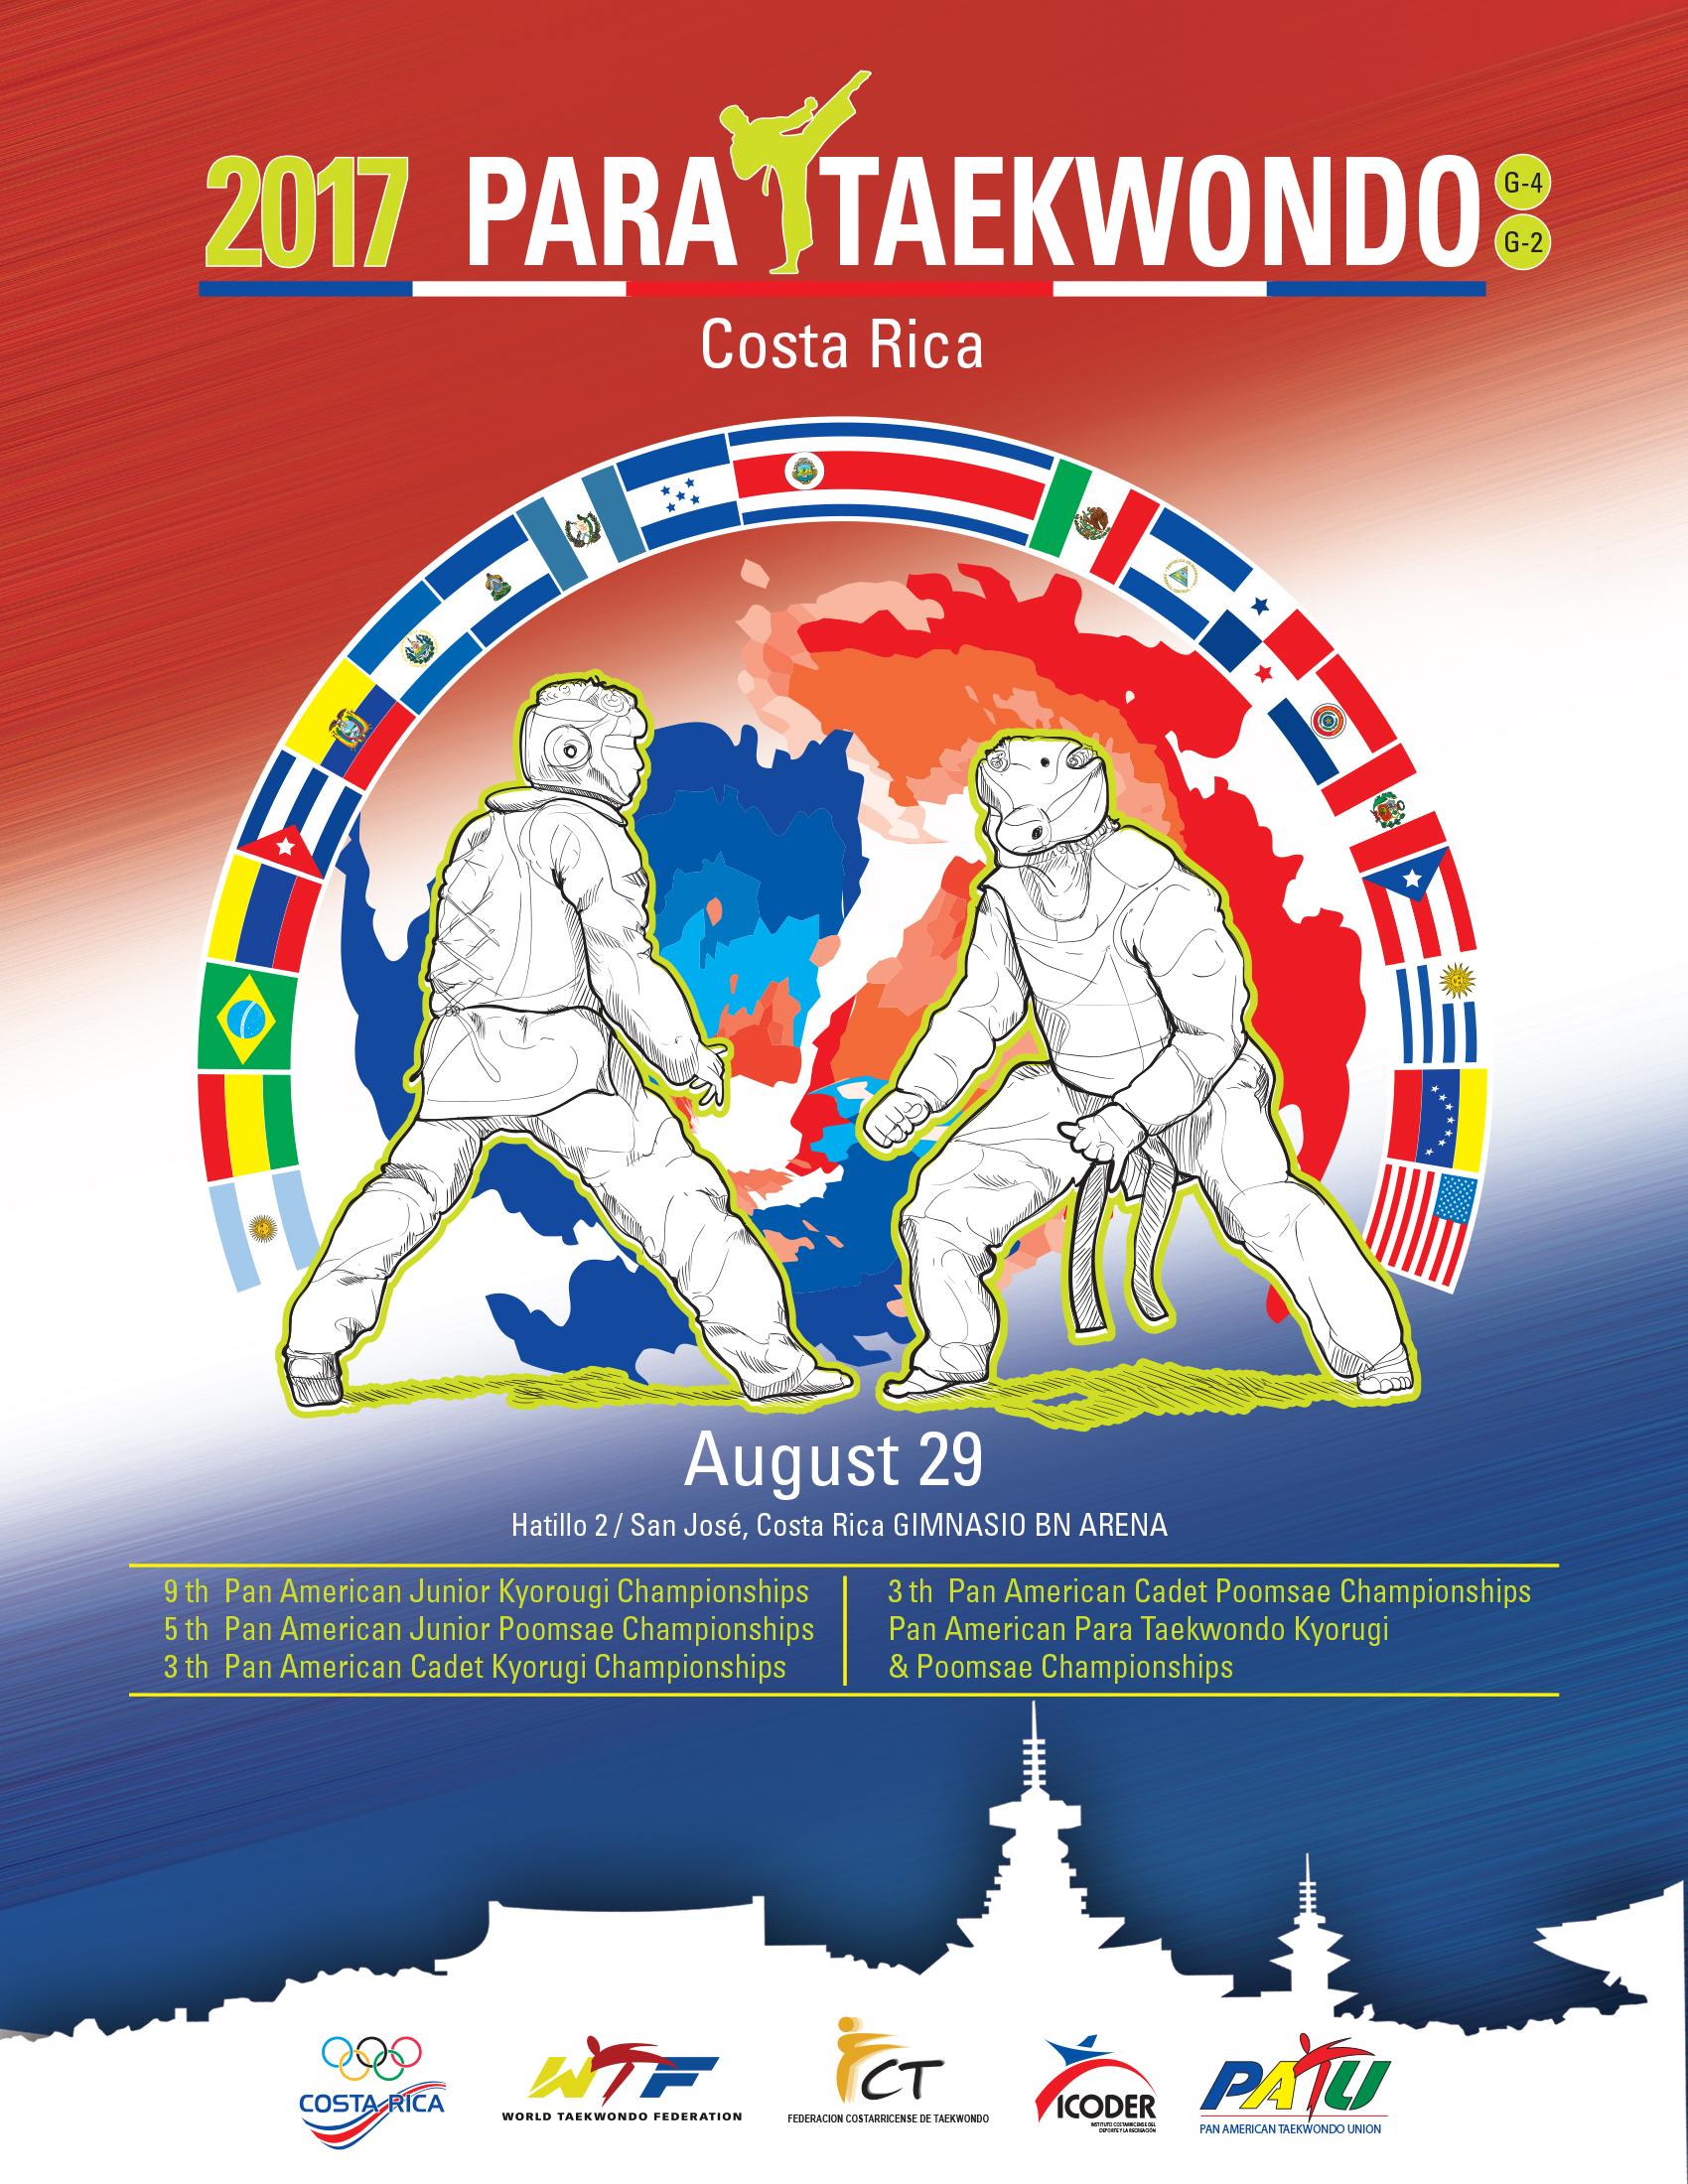 Para Taekwondo Panamerican Championships G-2 G-4